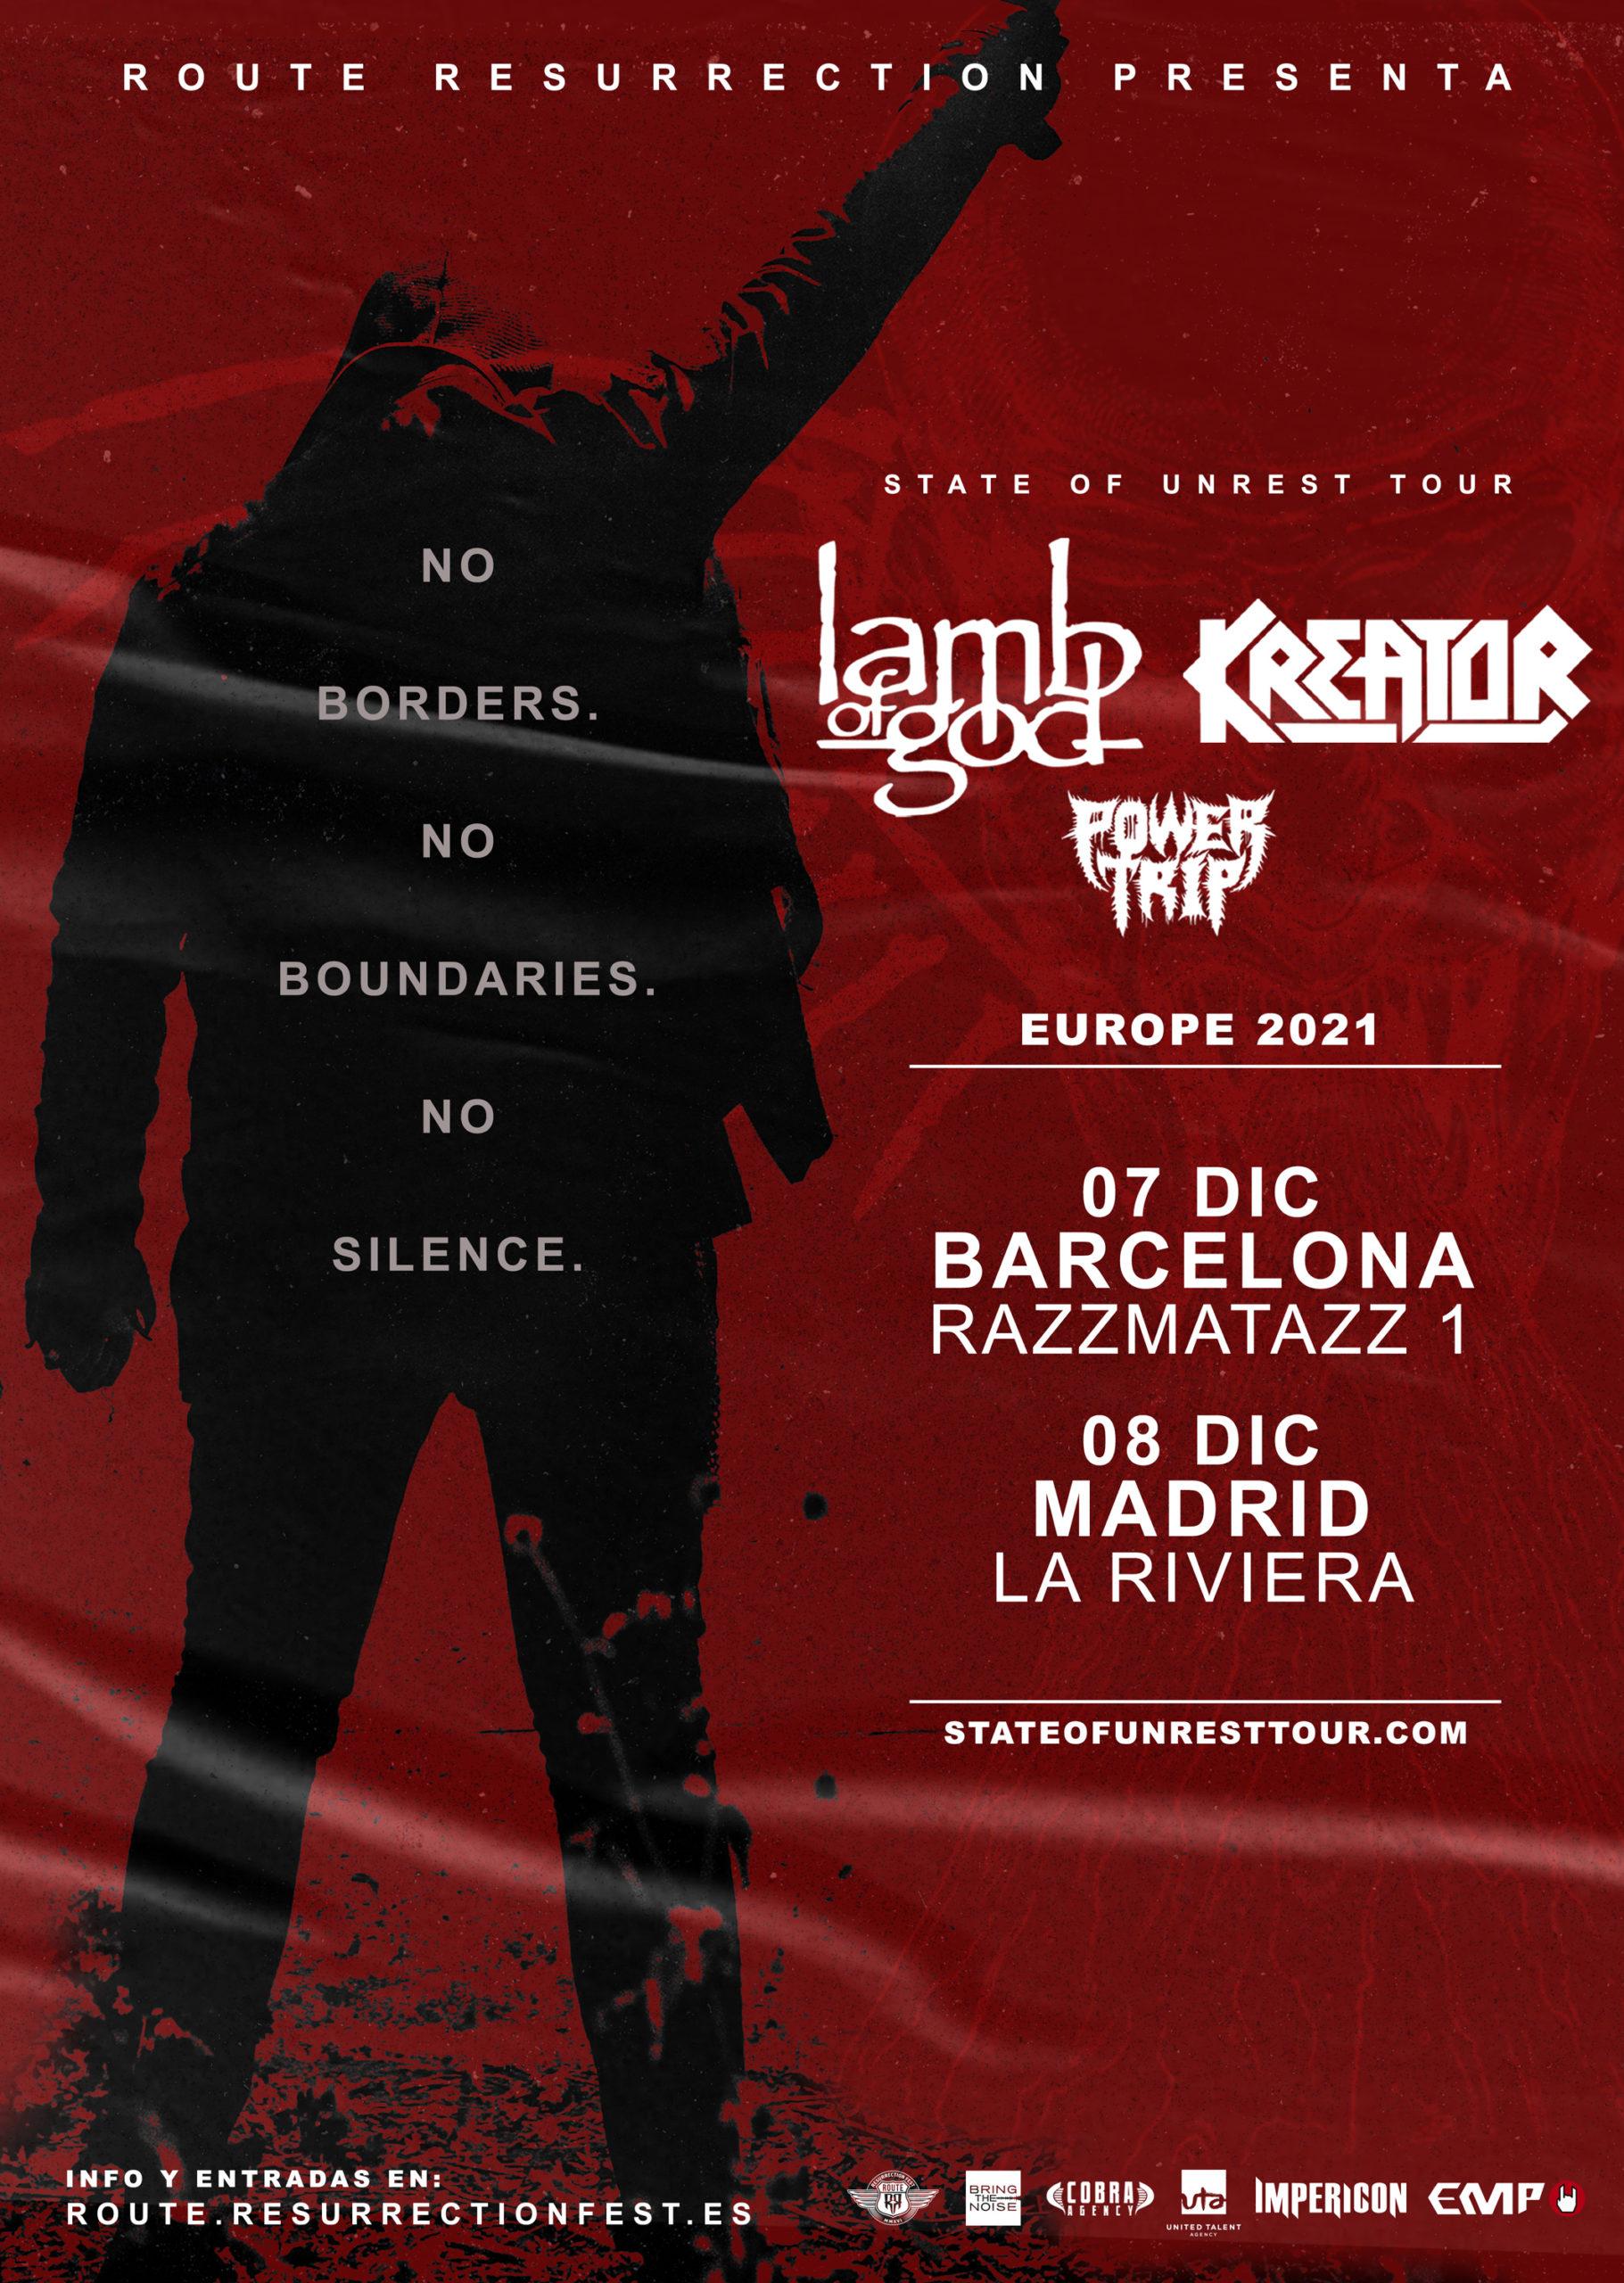 Route Resurrection 2021: Lamb of God y Kreator (Madrid)